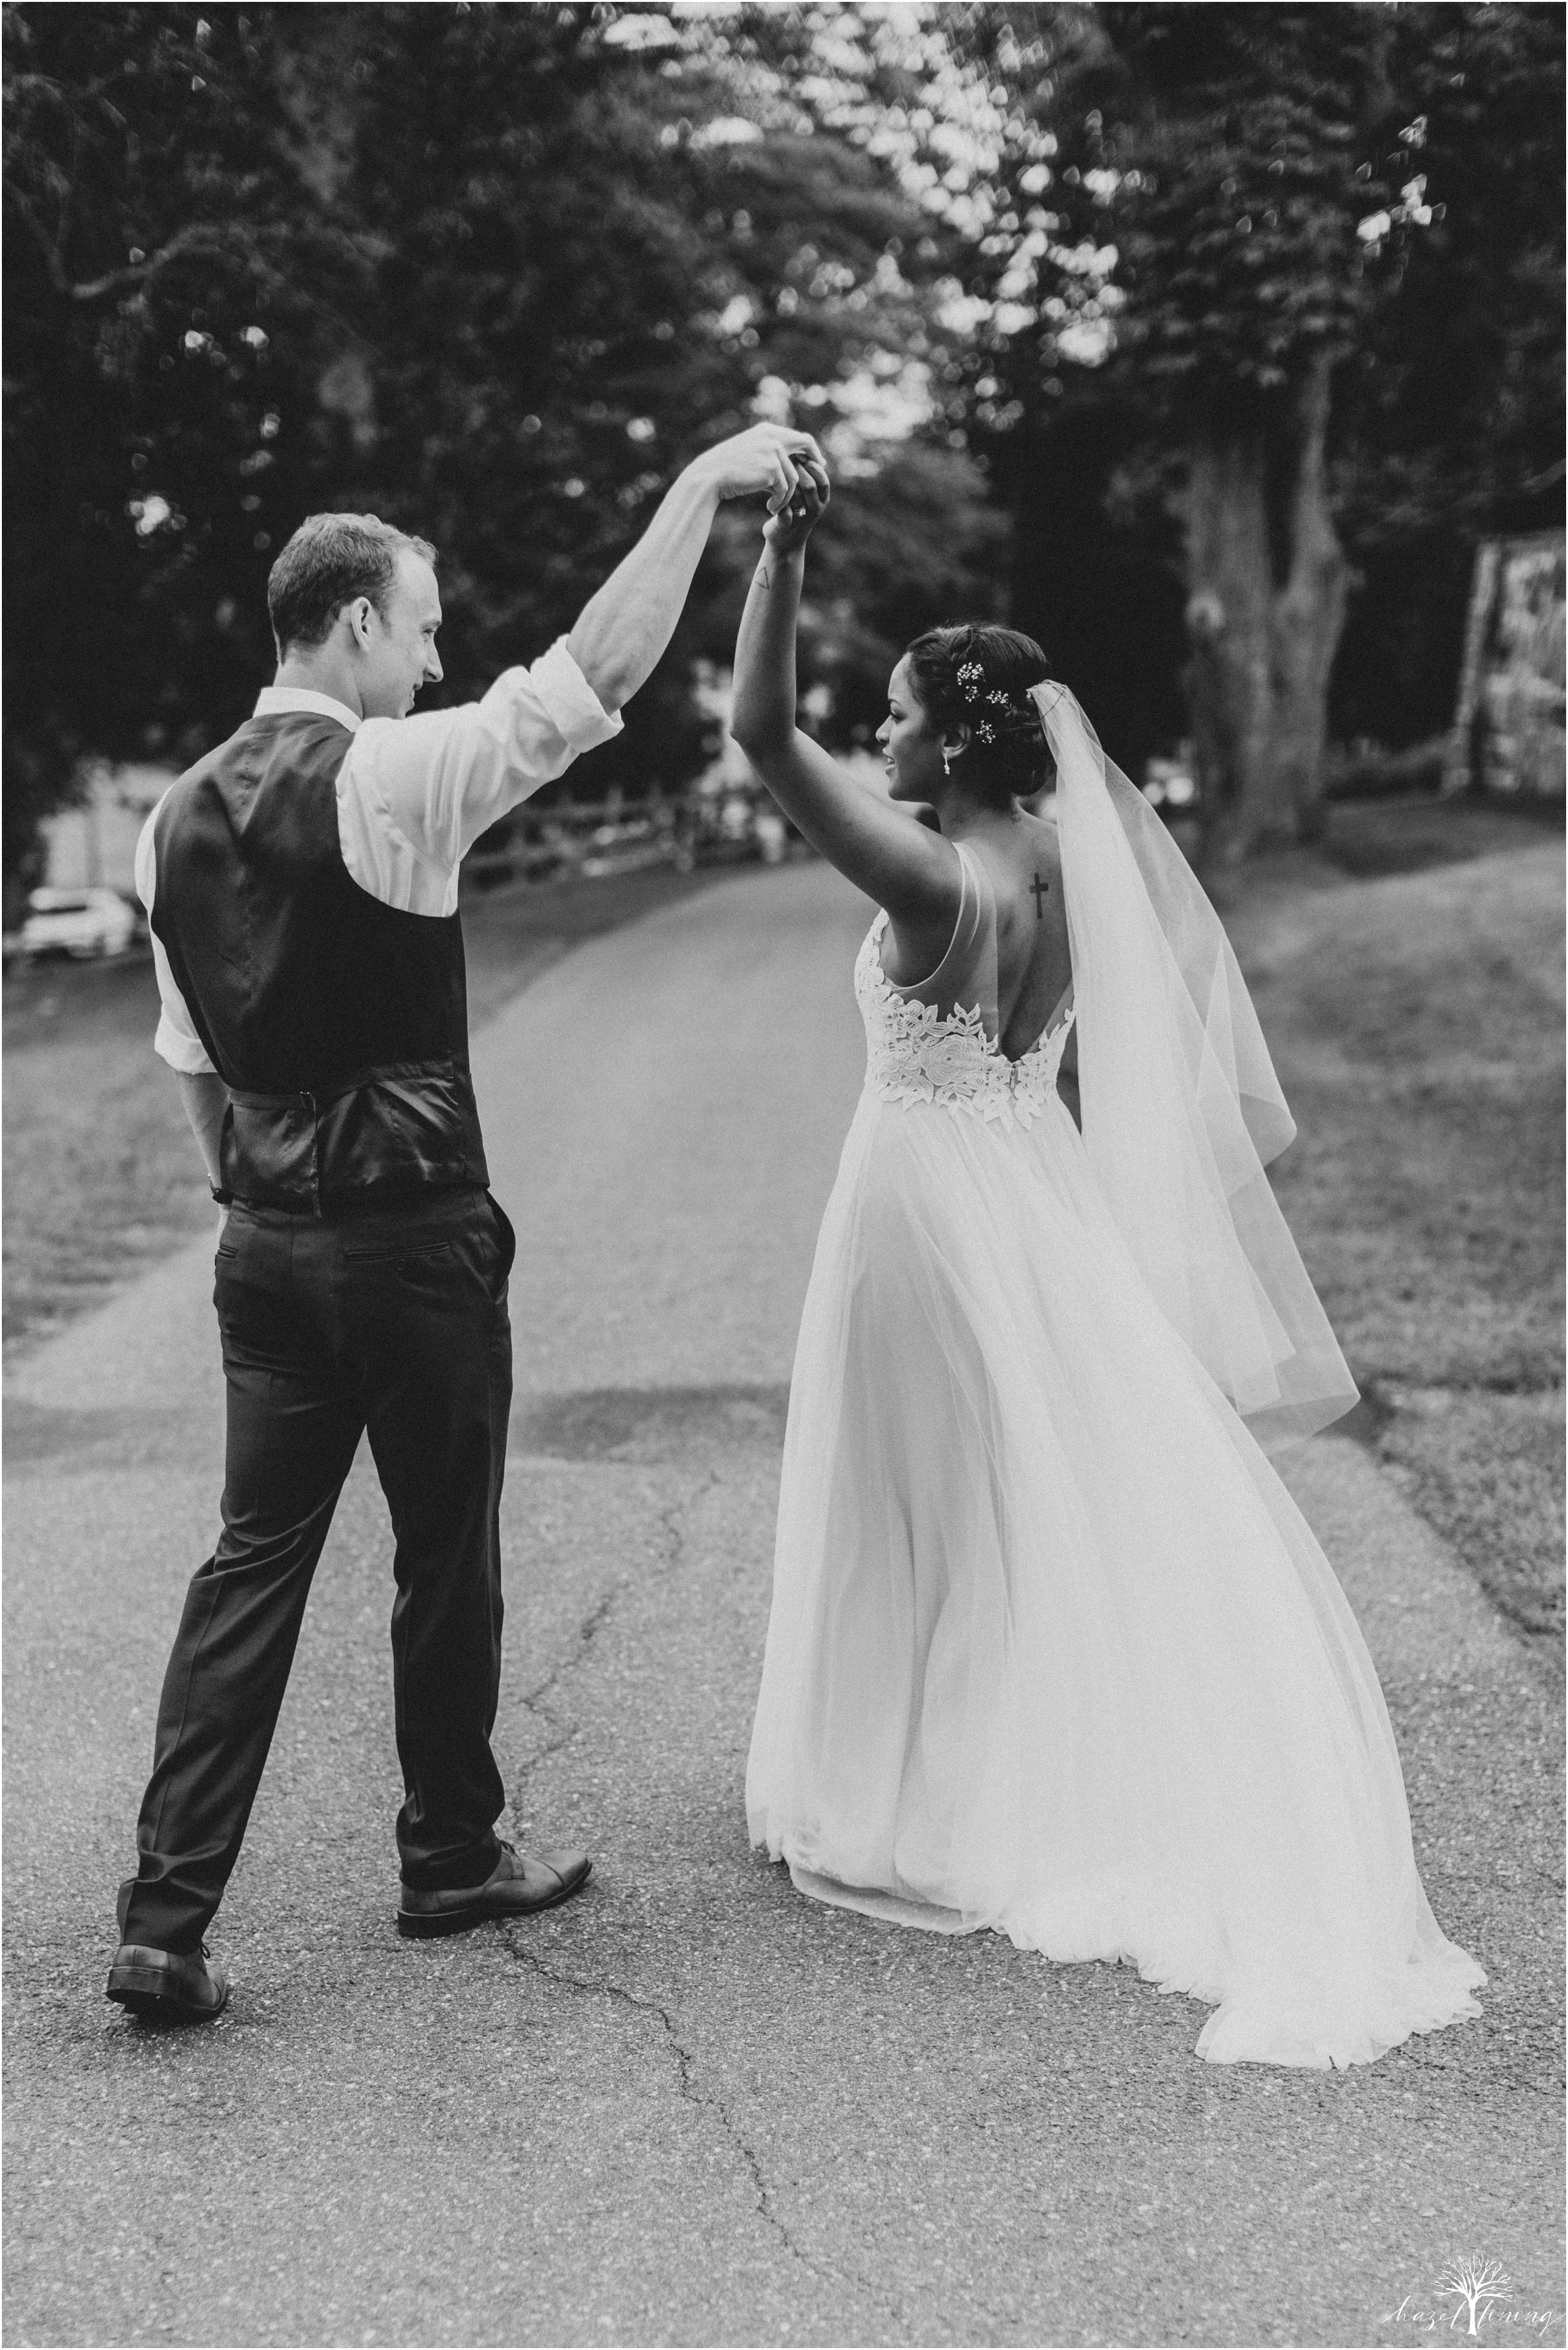 mariah-kreyling-samuel-sherratt-sherrattwiththeworld-peirce-farm-at-witch-hill-boston-massachusetts-wedding-photography-hazel-lining-travel-wedding-elopement-photography_0132.jpg